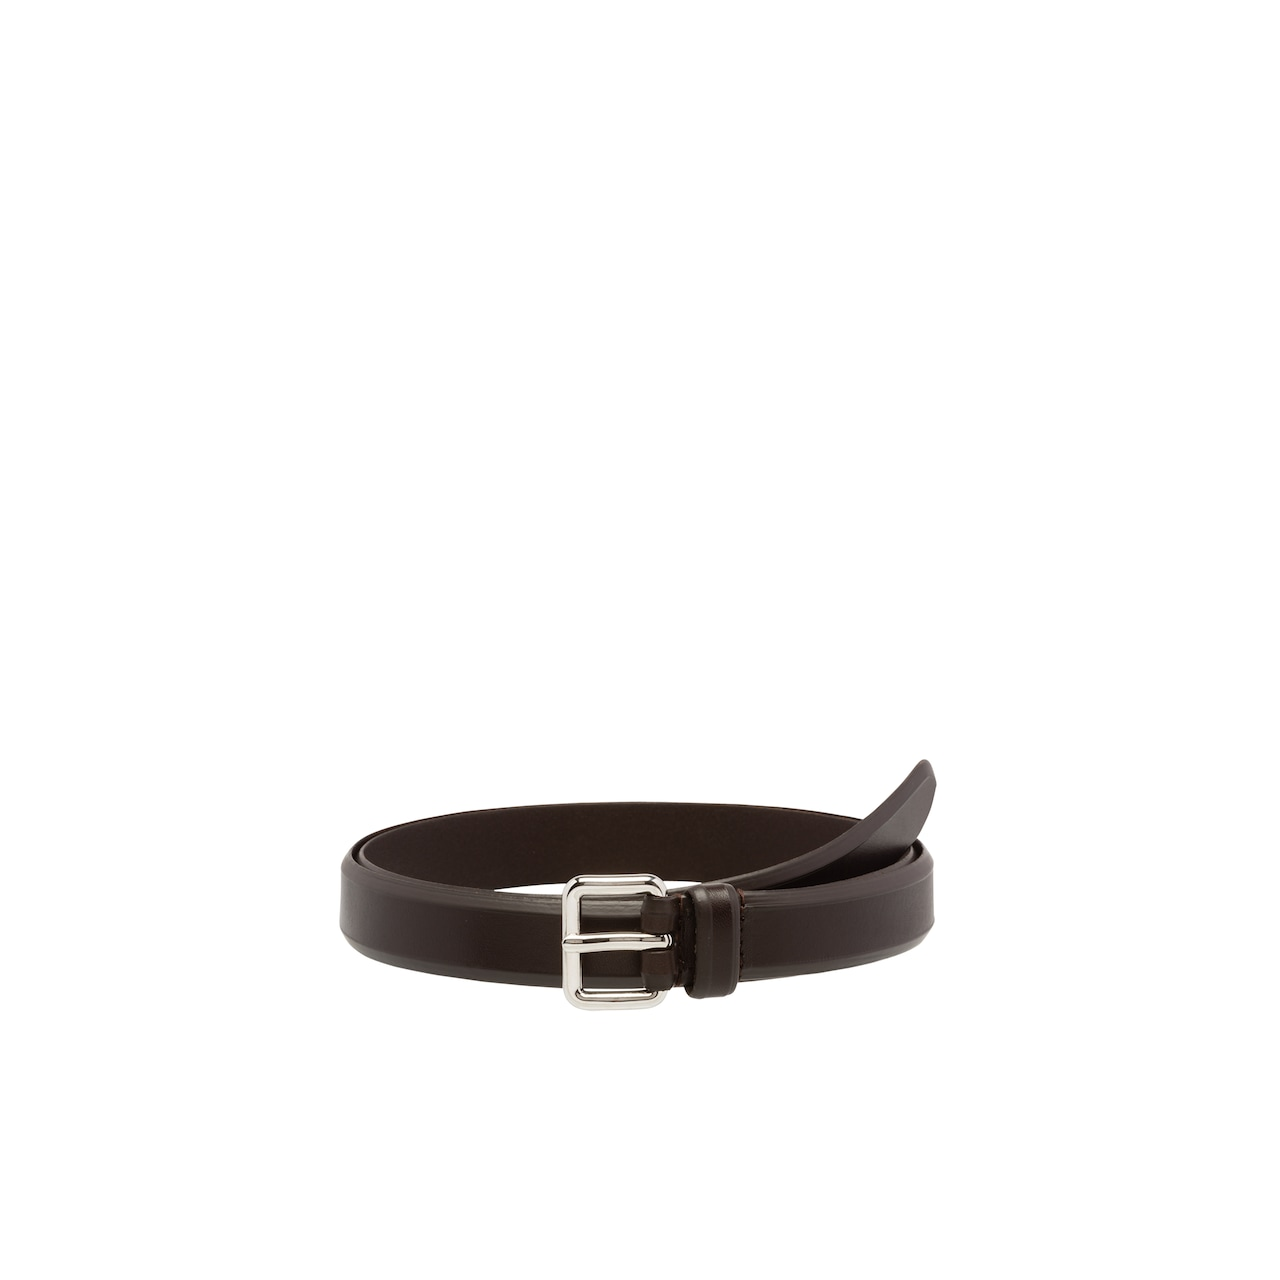 Prada Leather Belt 1